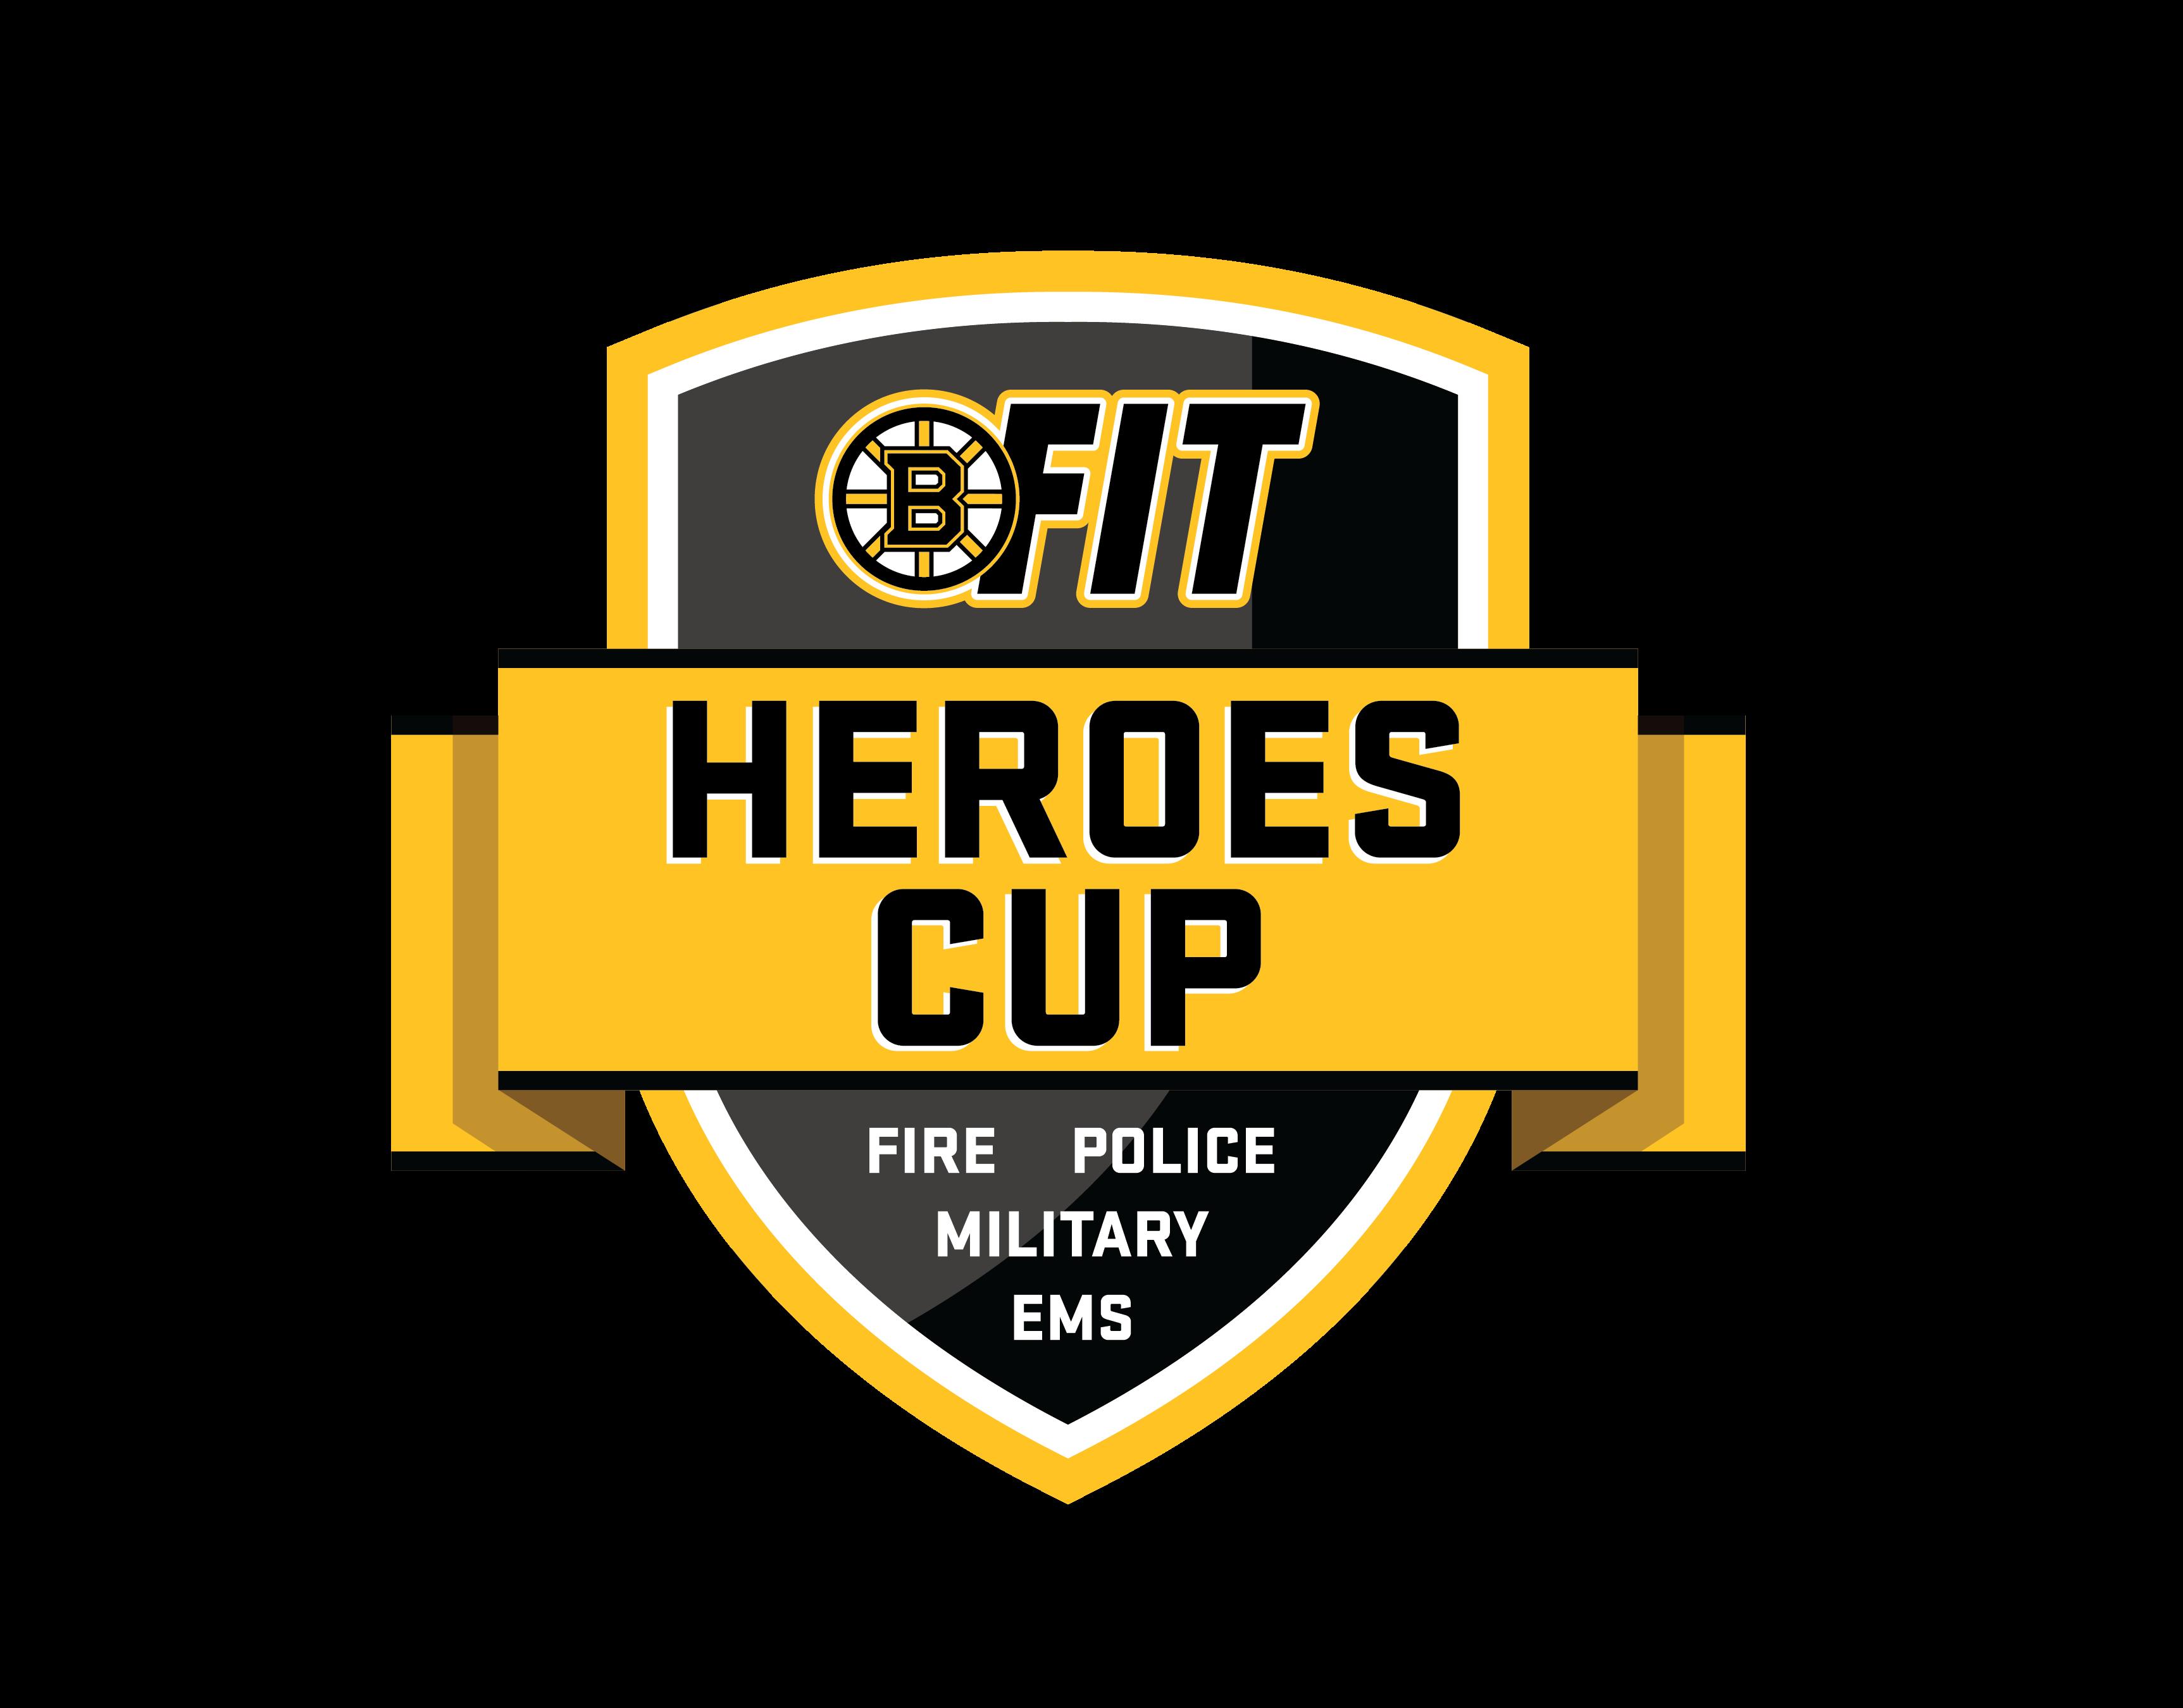 Bruins Heros cup High res